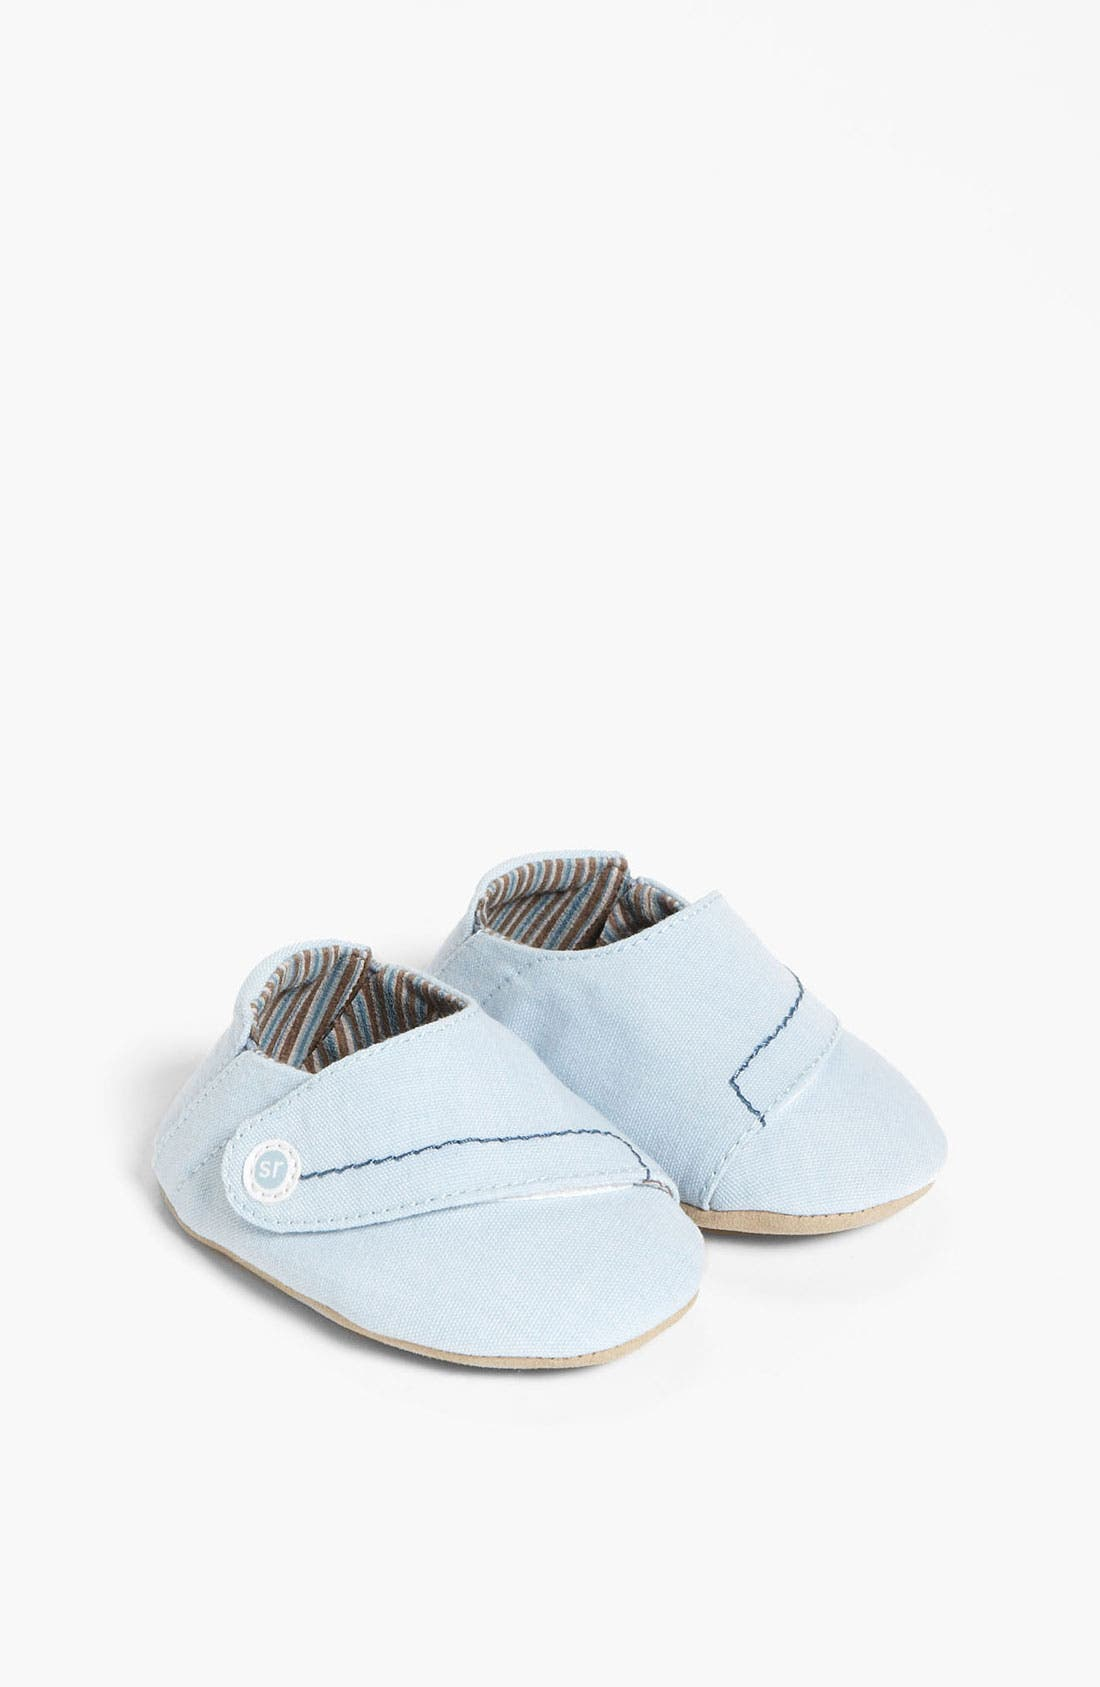 Main Image - Stride Rite 'Blue Dream' Crib Shoe (Baby)